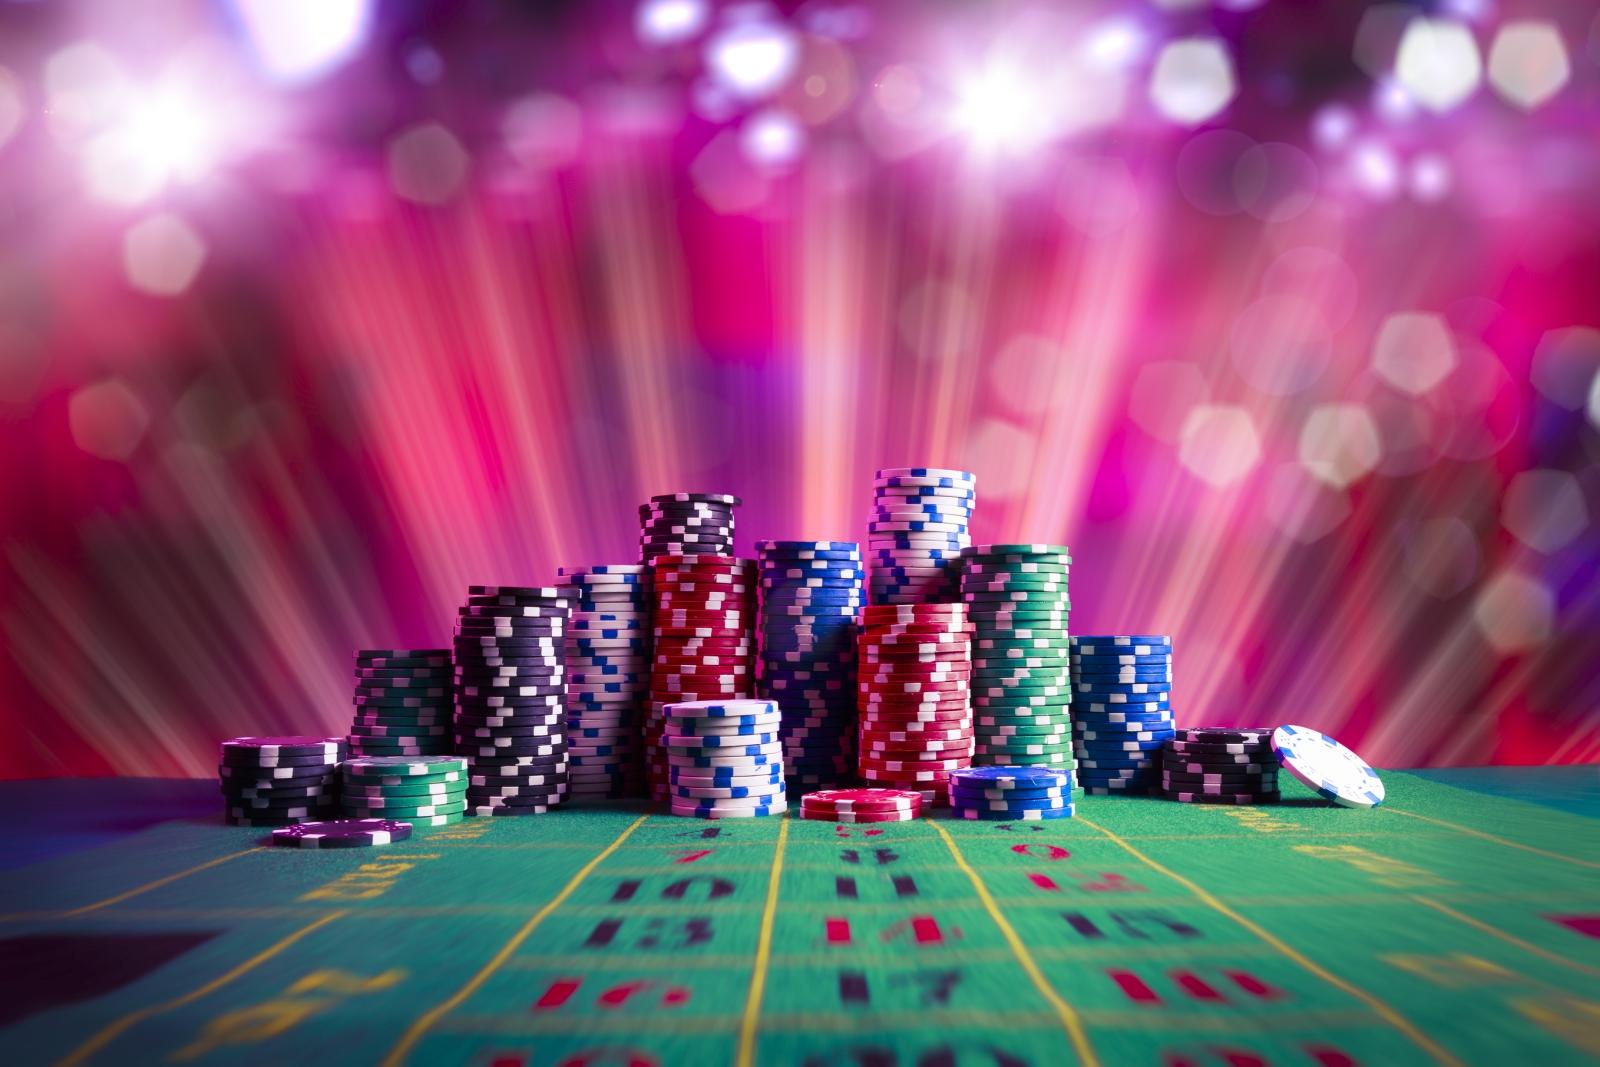 us online casino kostenlosspiele.de